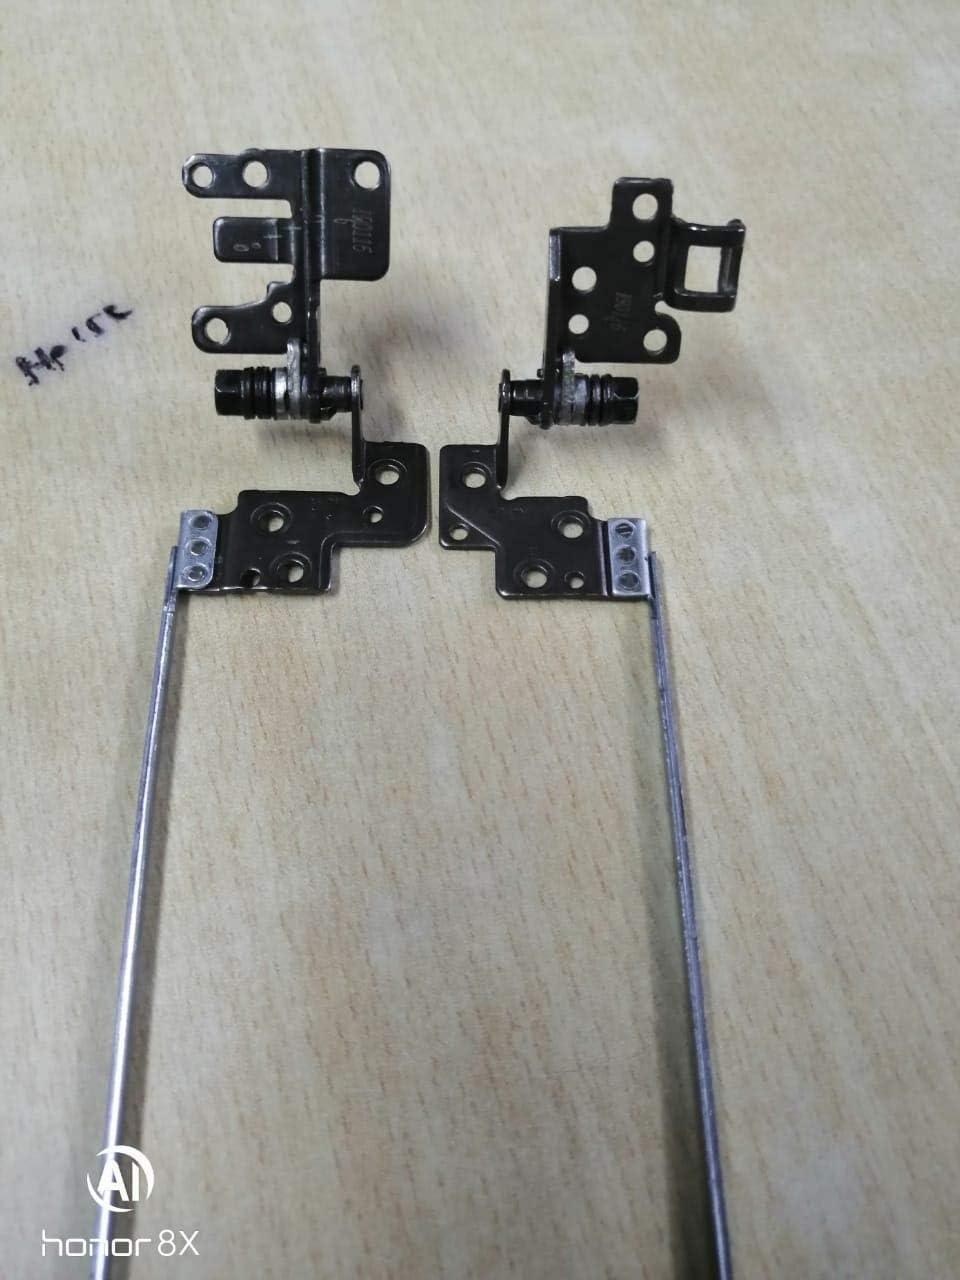 Nbparts New for Acer Aspire E5-575 E5-575G E5-575T E5-575TG Left Right LCD Hinges Set